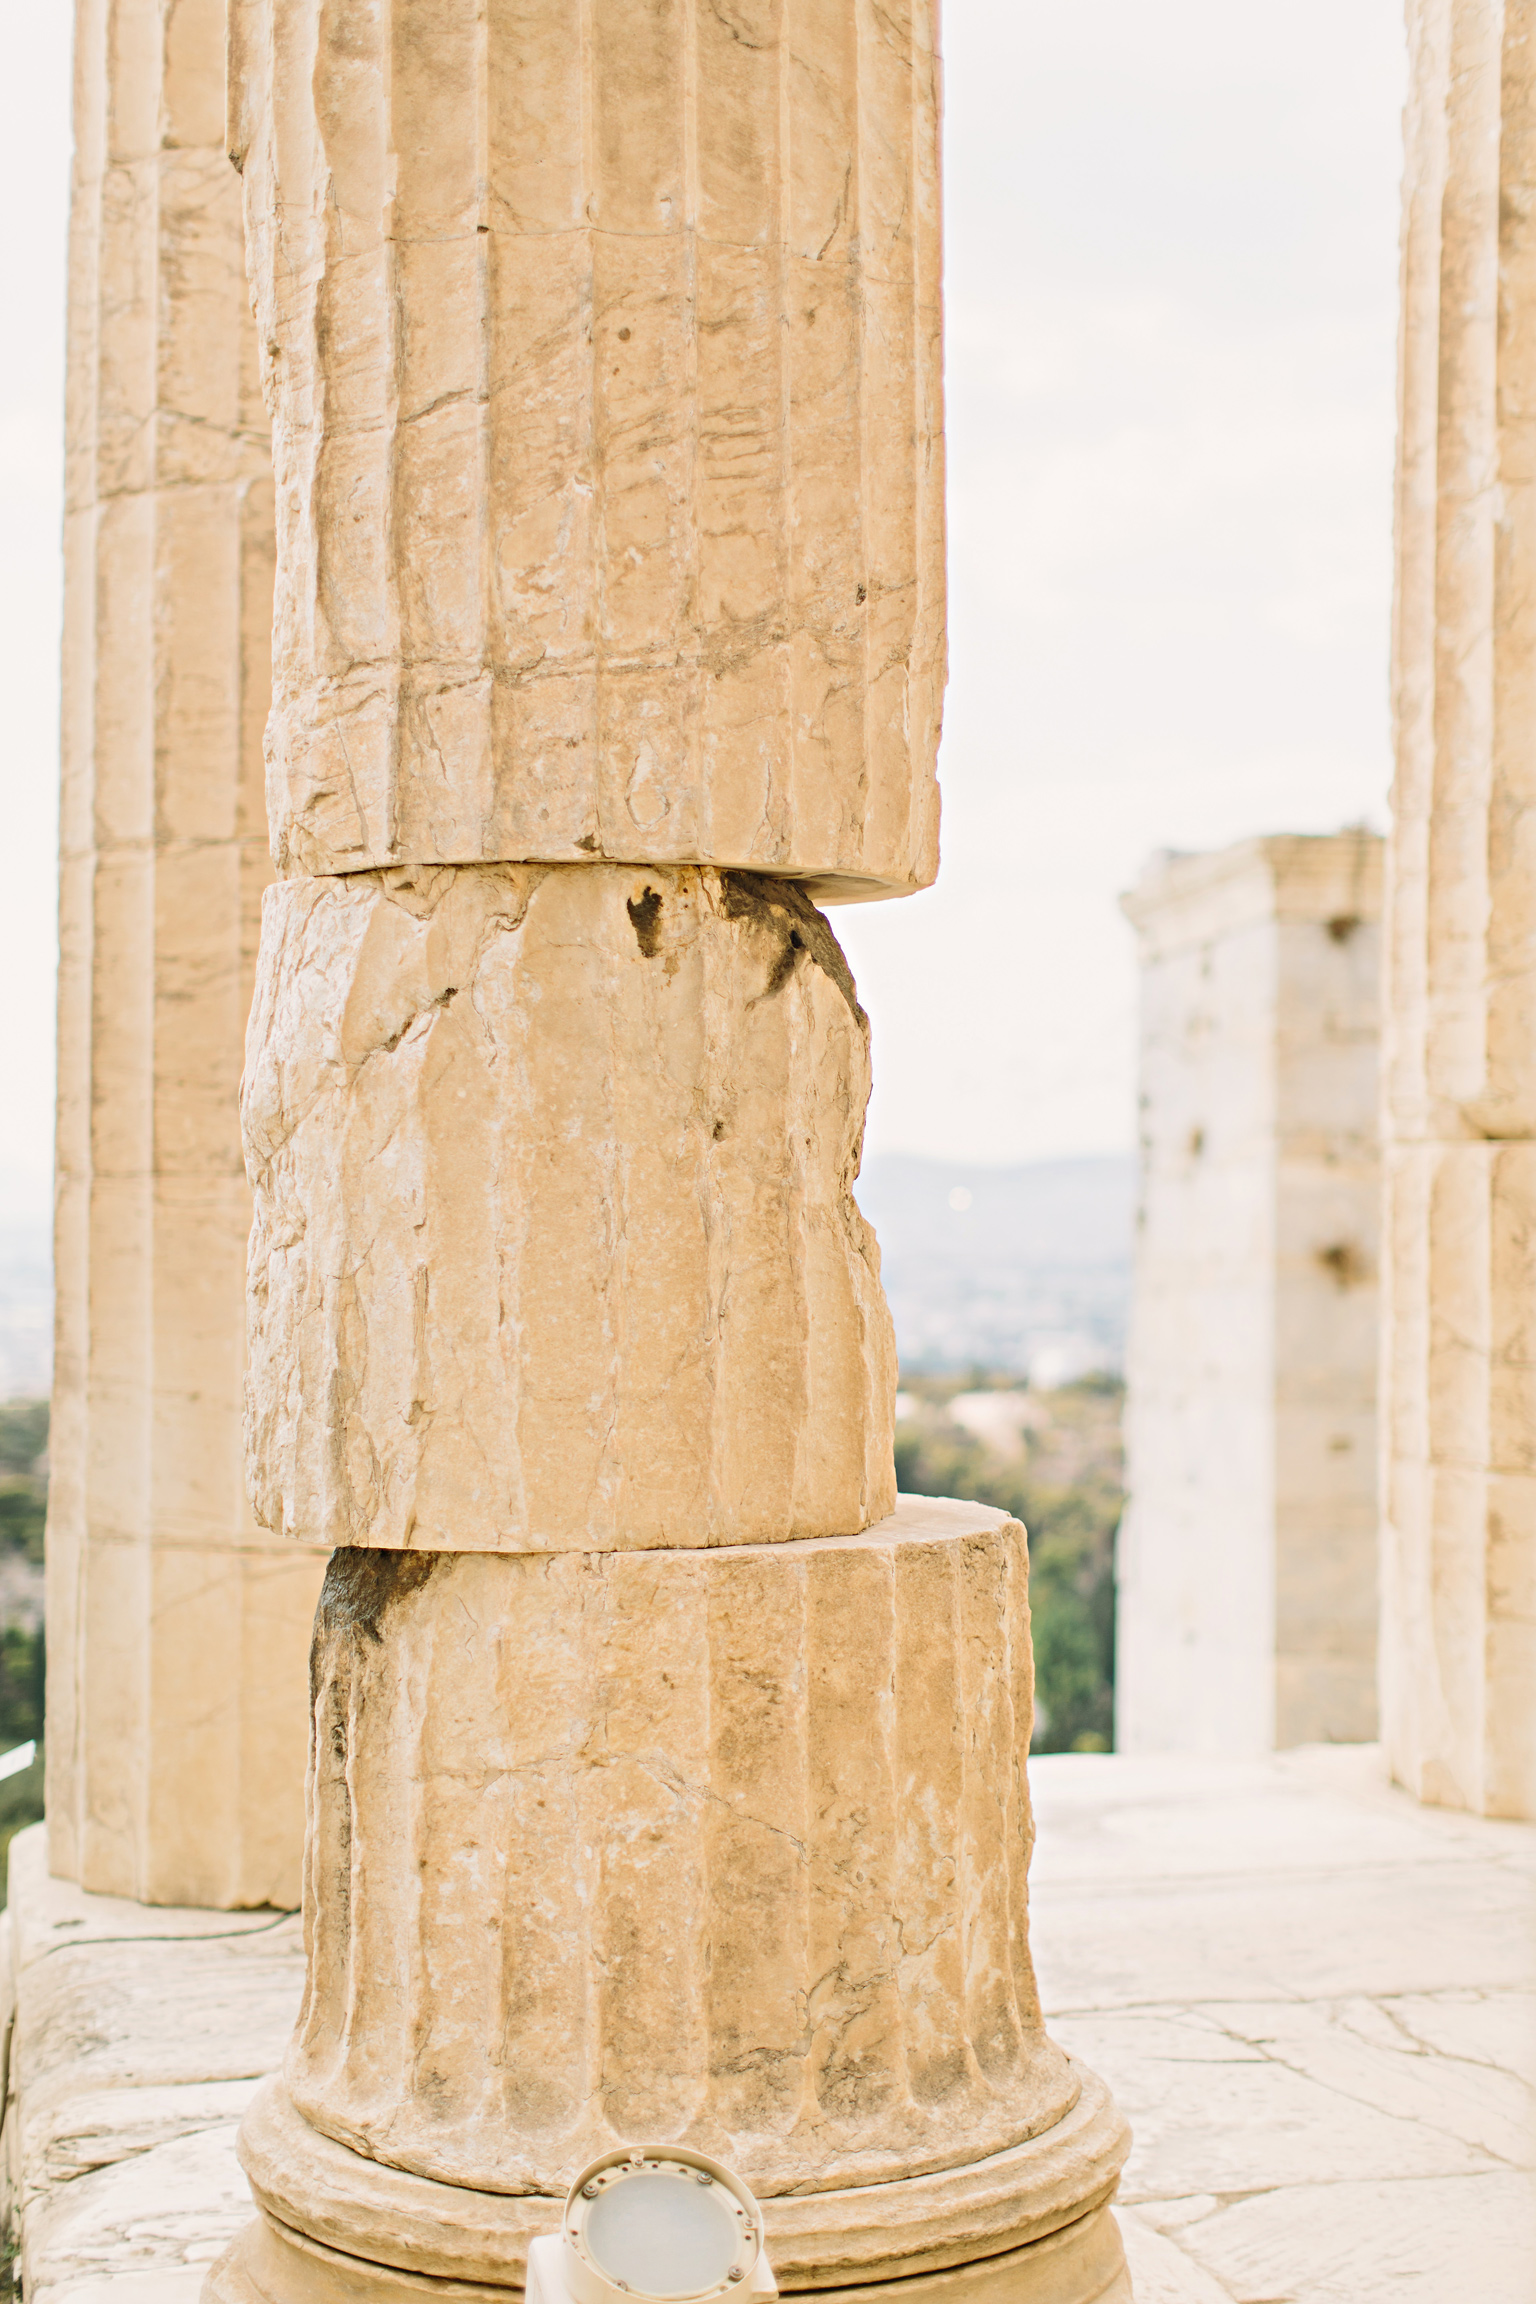 CindyGiovagnoli_Athens_Greece_travel_photographer-056.jpg